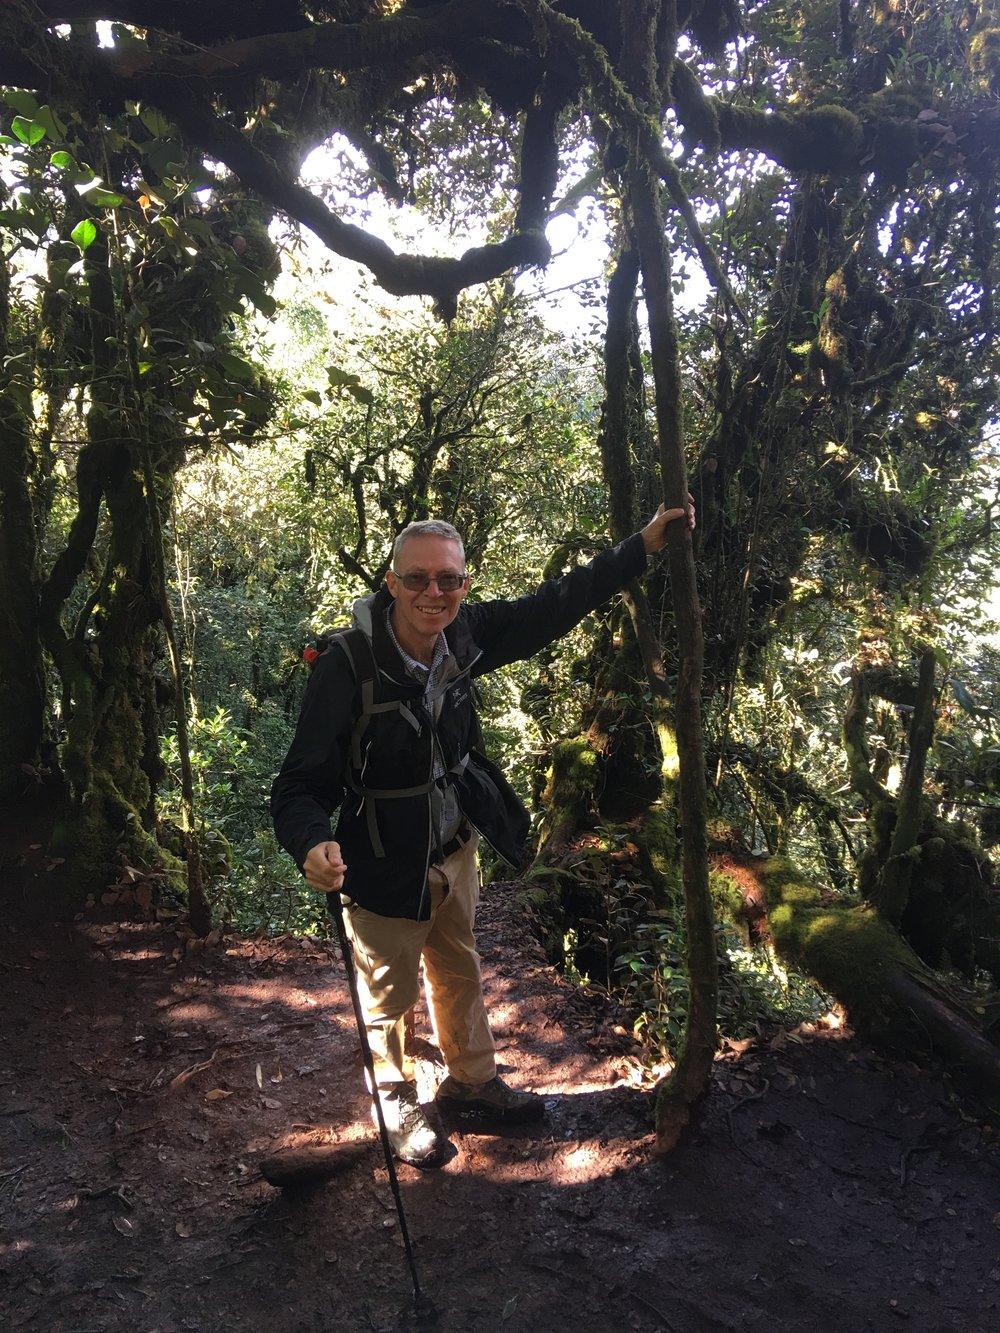 Mossy forest walk